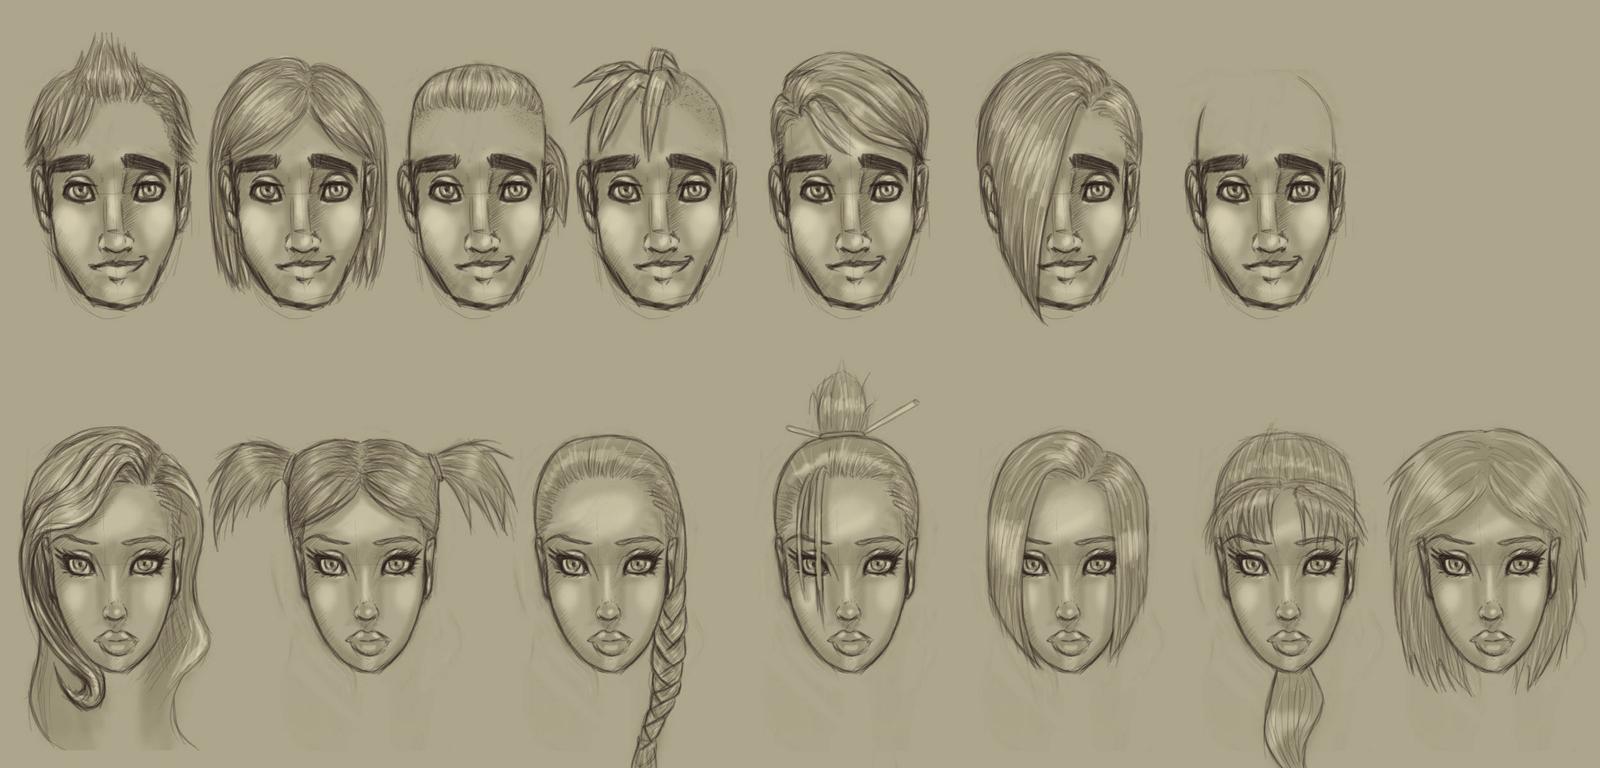 Bailamo - Character hairstyles